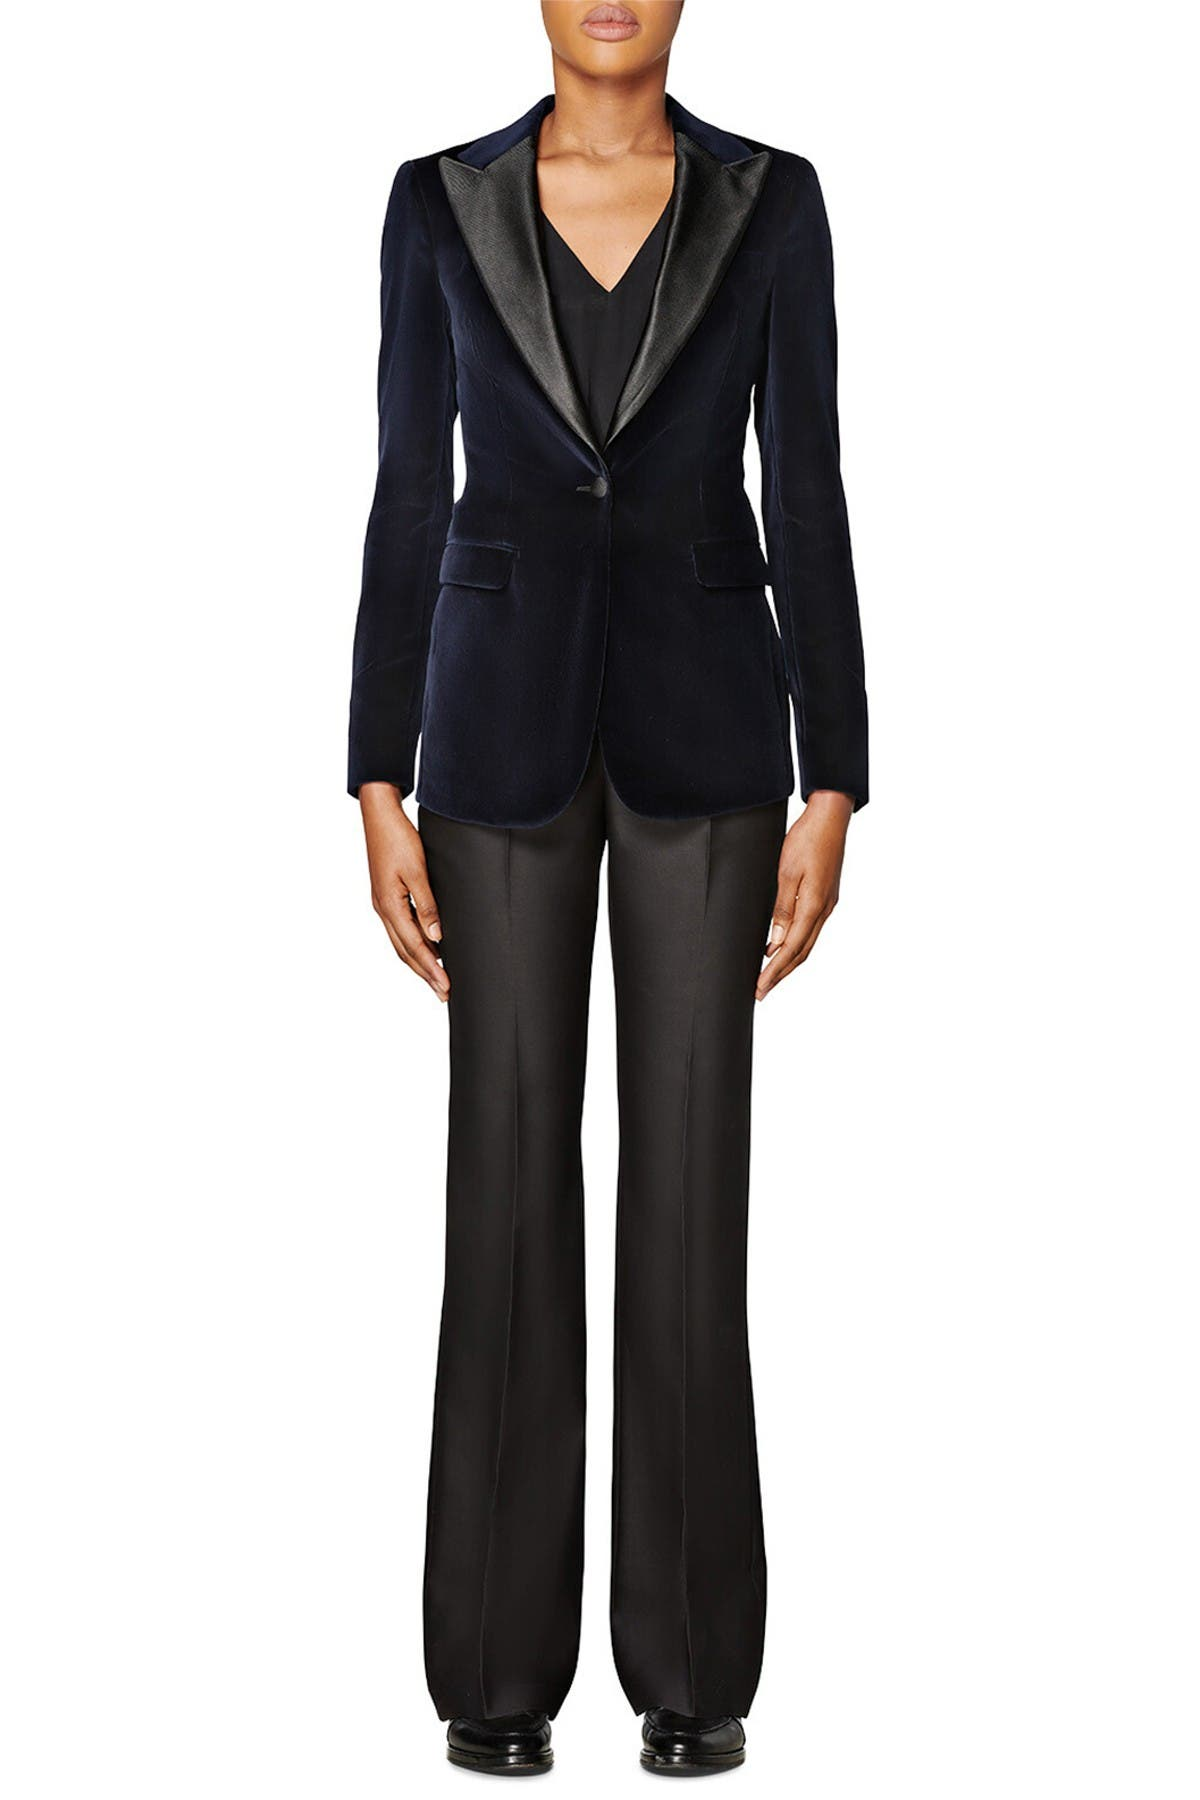 Image of SUISTUDIO Cameron Peak Velvet Tuxedo Jacket